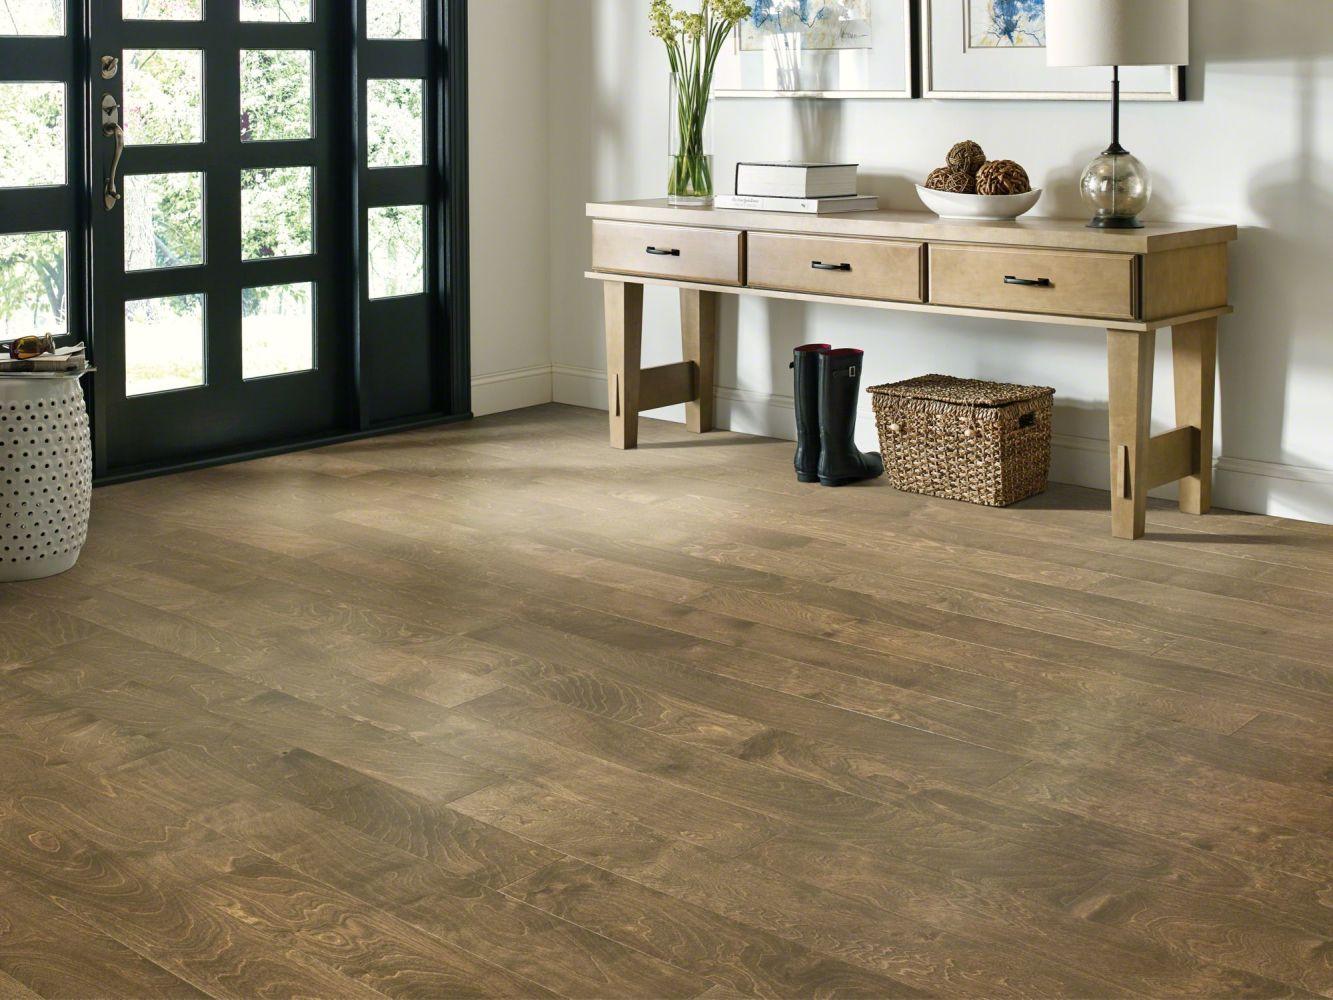 Shaw Floors Home Fn Gold Hardwood Boca Raton Parasail 02022_HW492